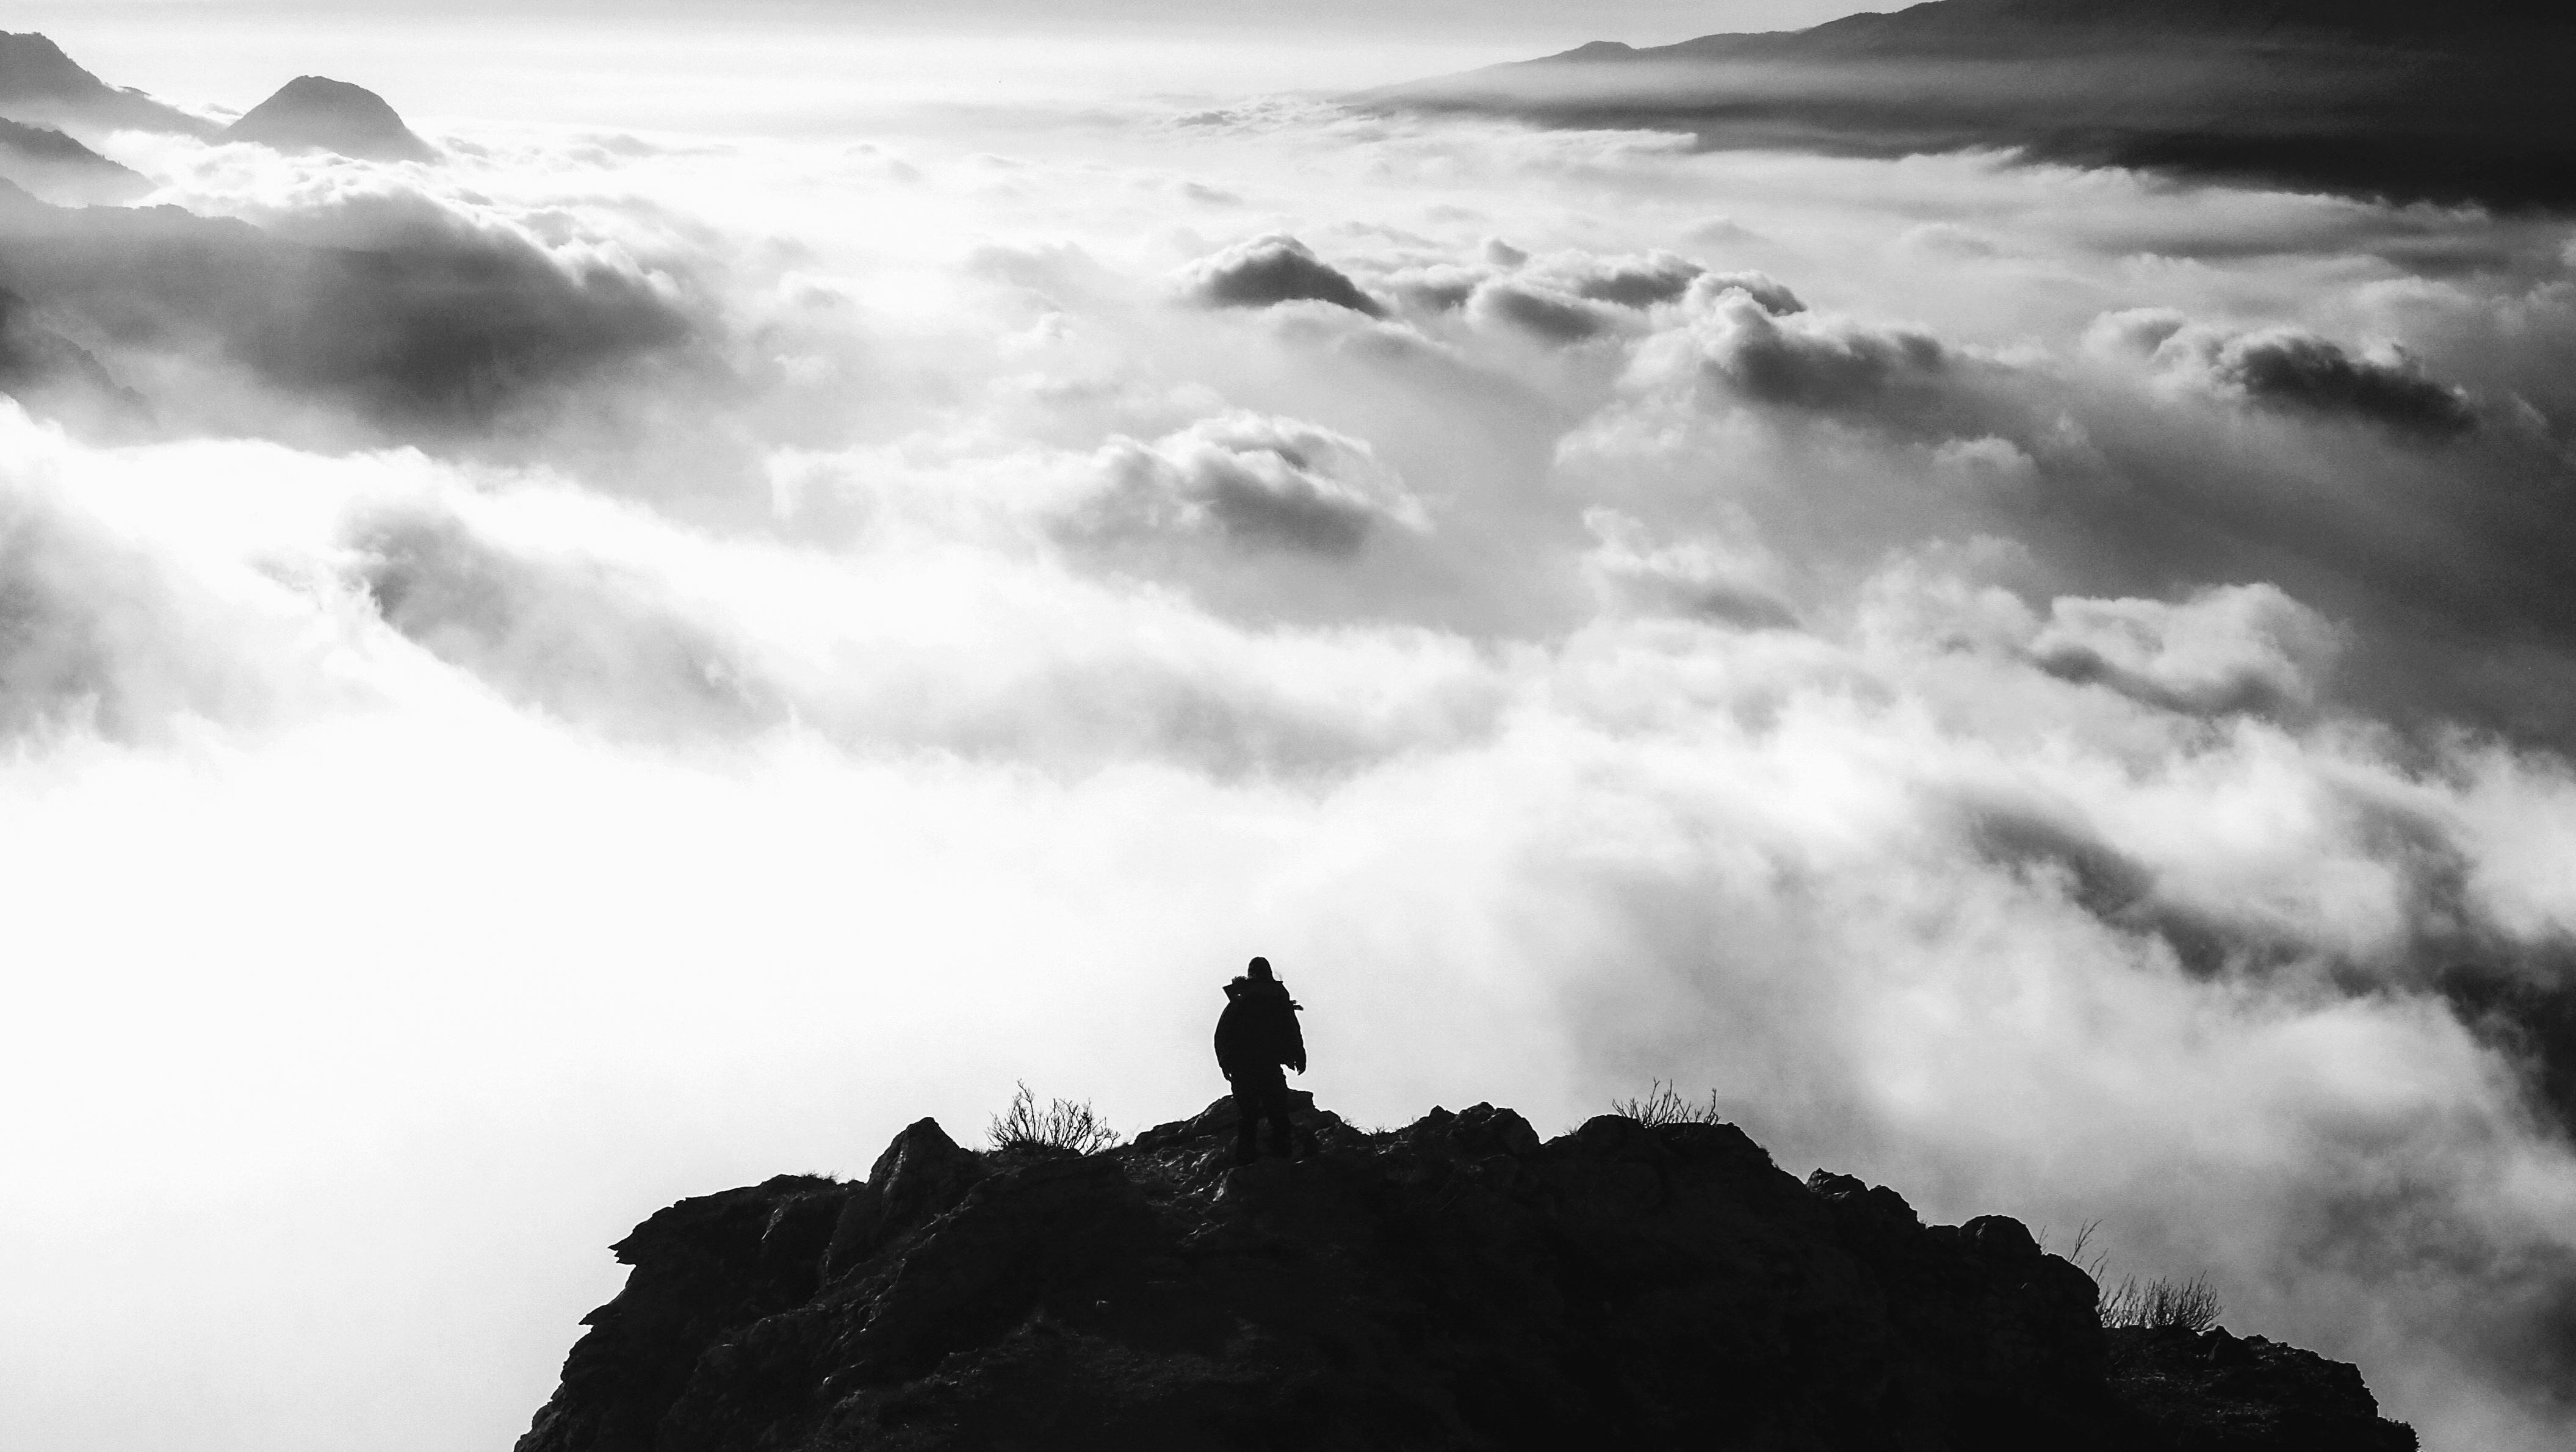 Imagen Gratis Hombre Alpinista Monta 241 A Rocas Cielo